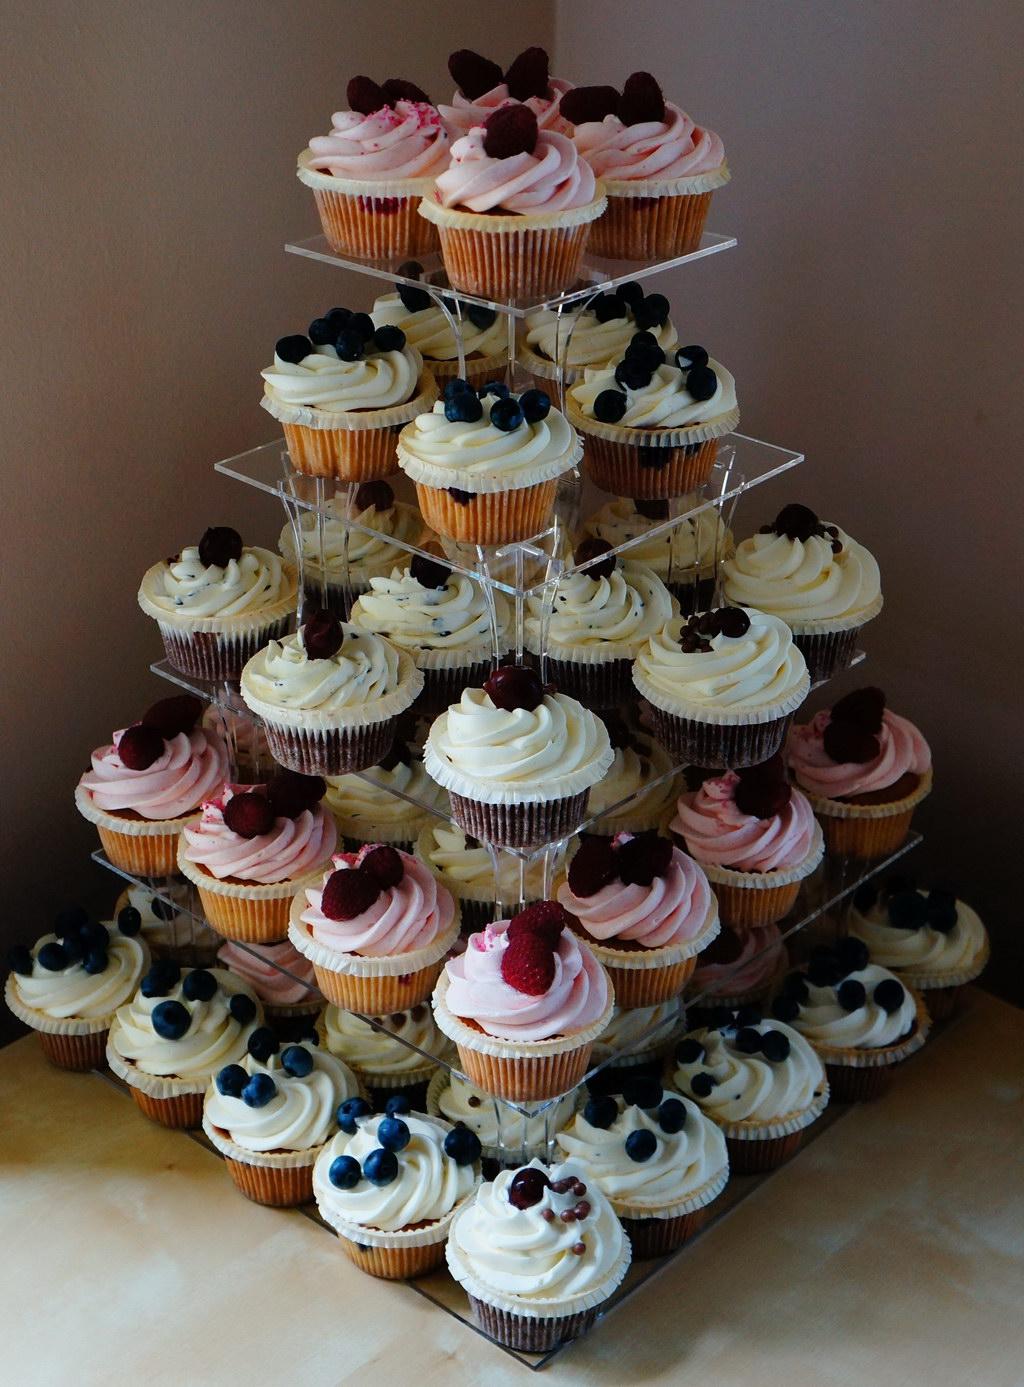 london patisserie wedding cupcakes cake. Black Bedroom Furniture Sets. Home Design Ideas